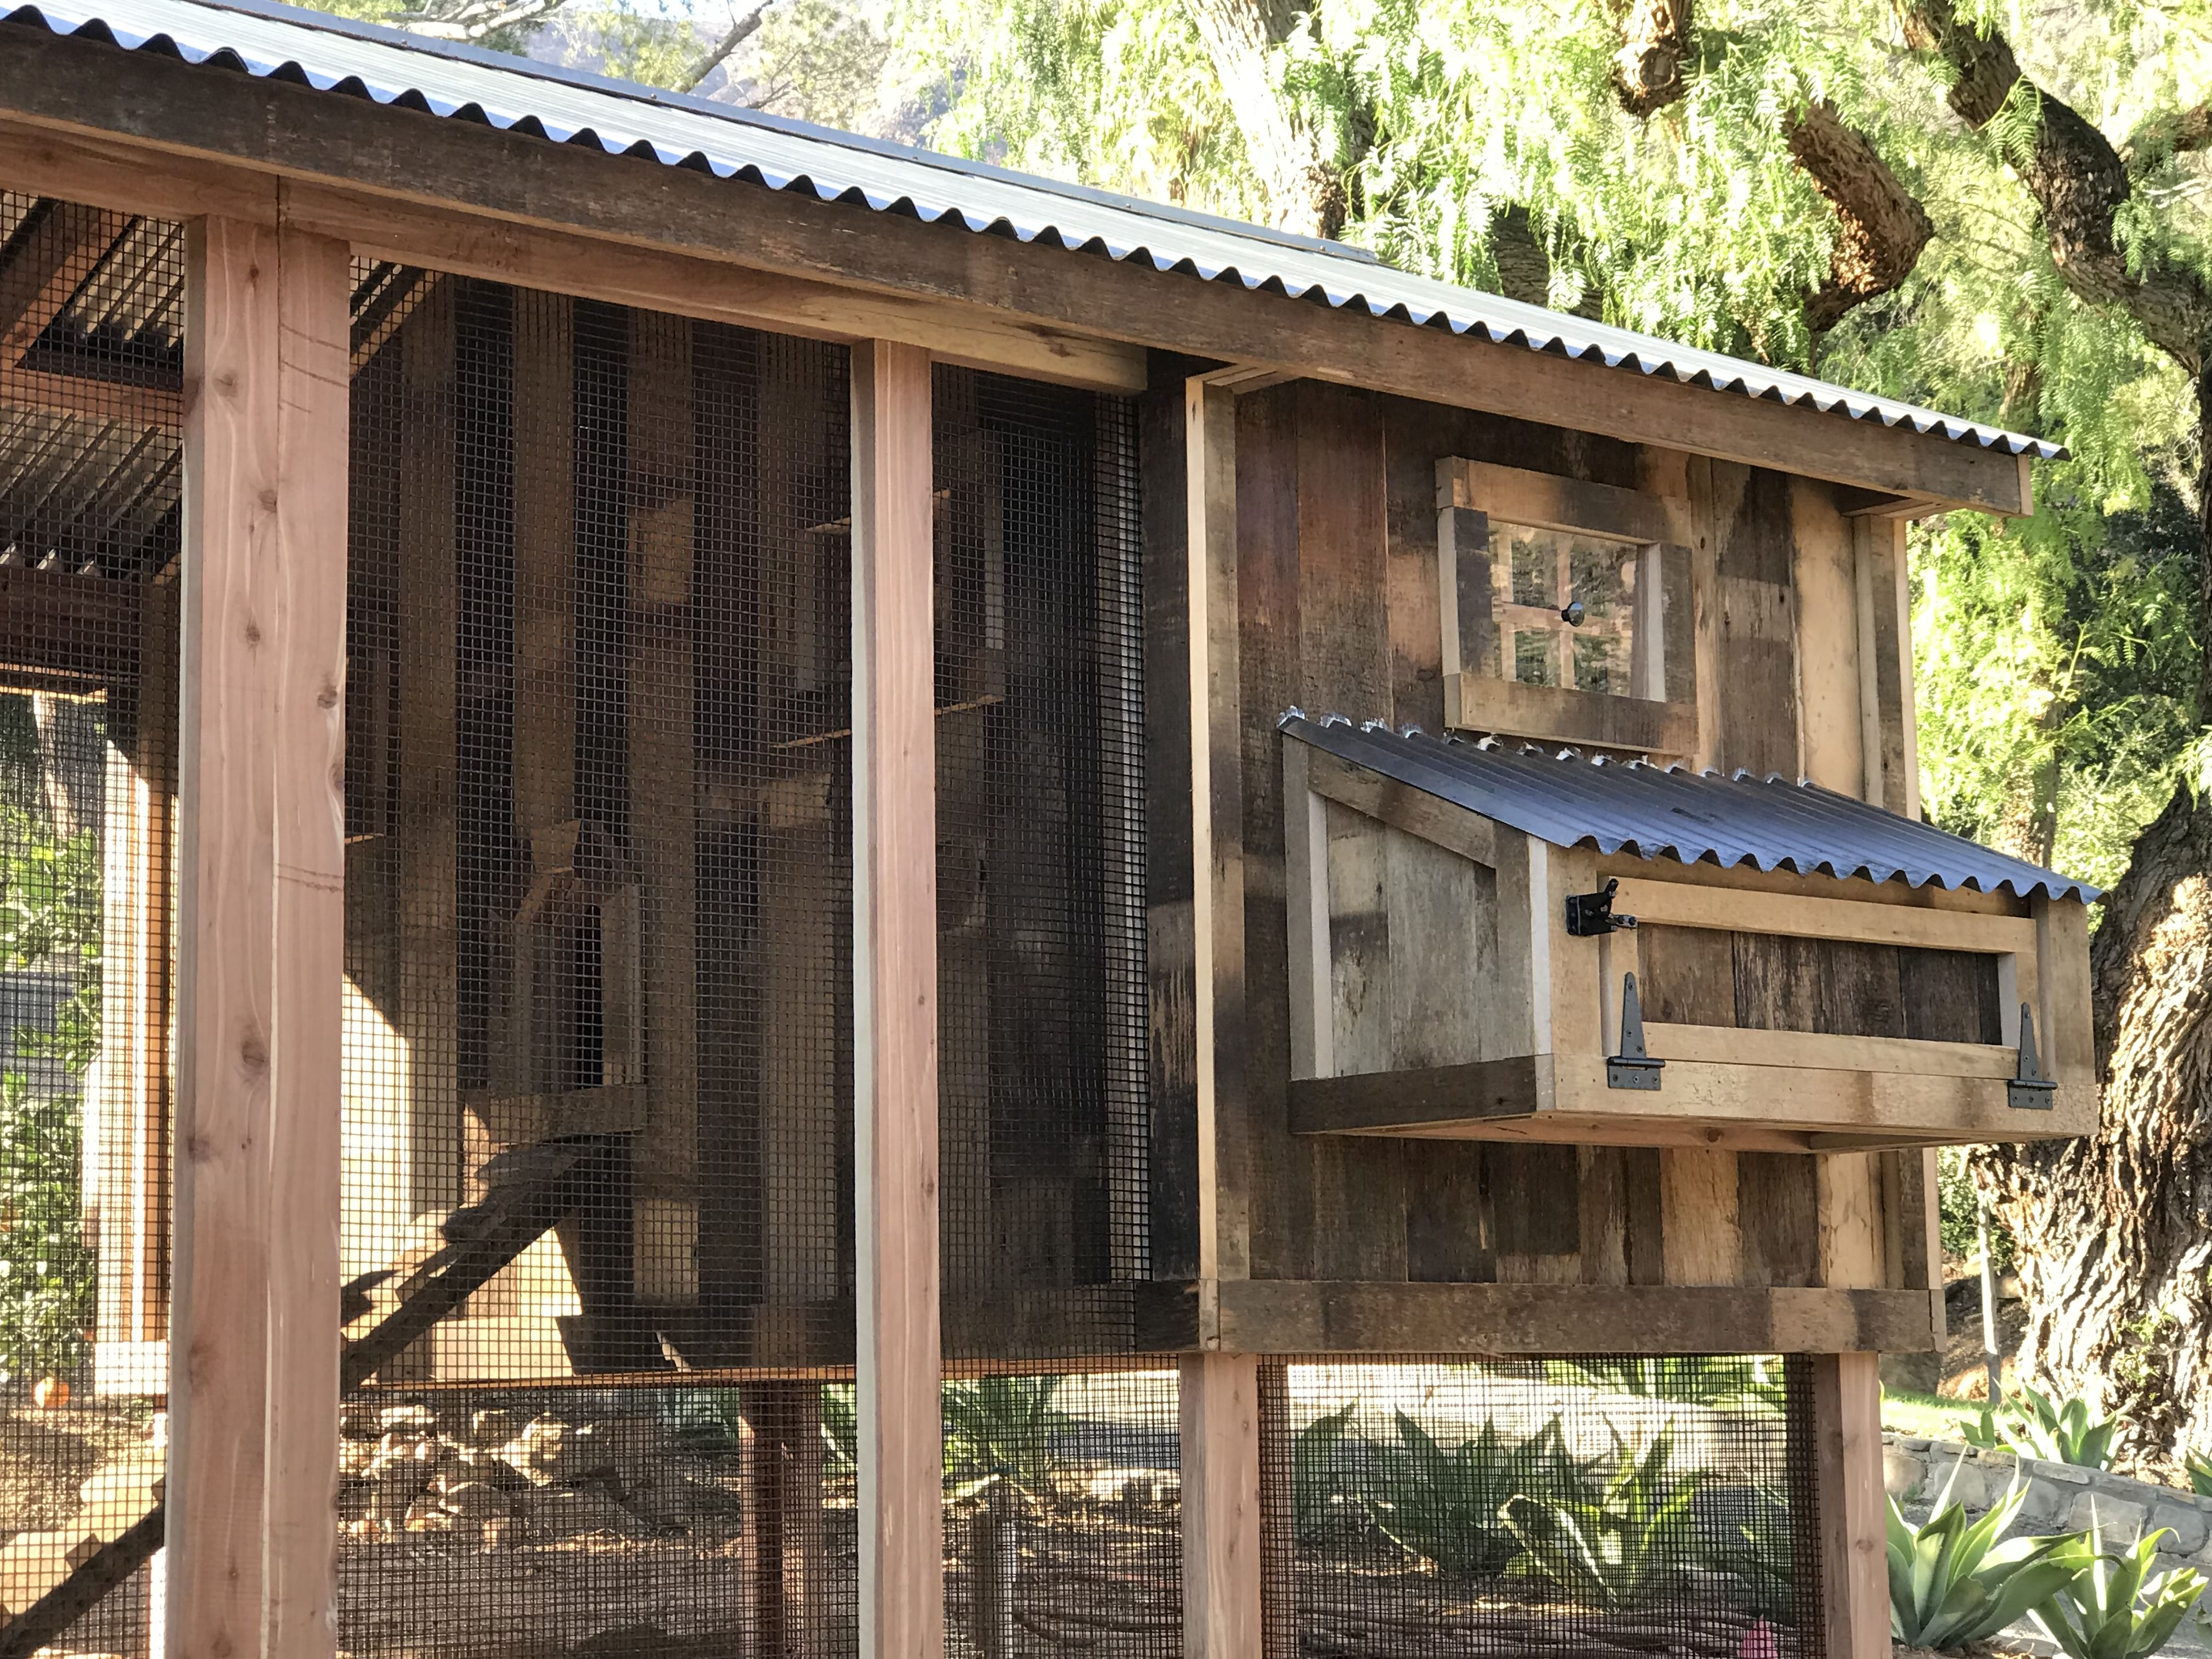 Red cedar reclaimed barn wood coop with saltbox roof in Ojai, CA